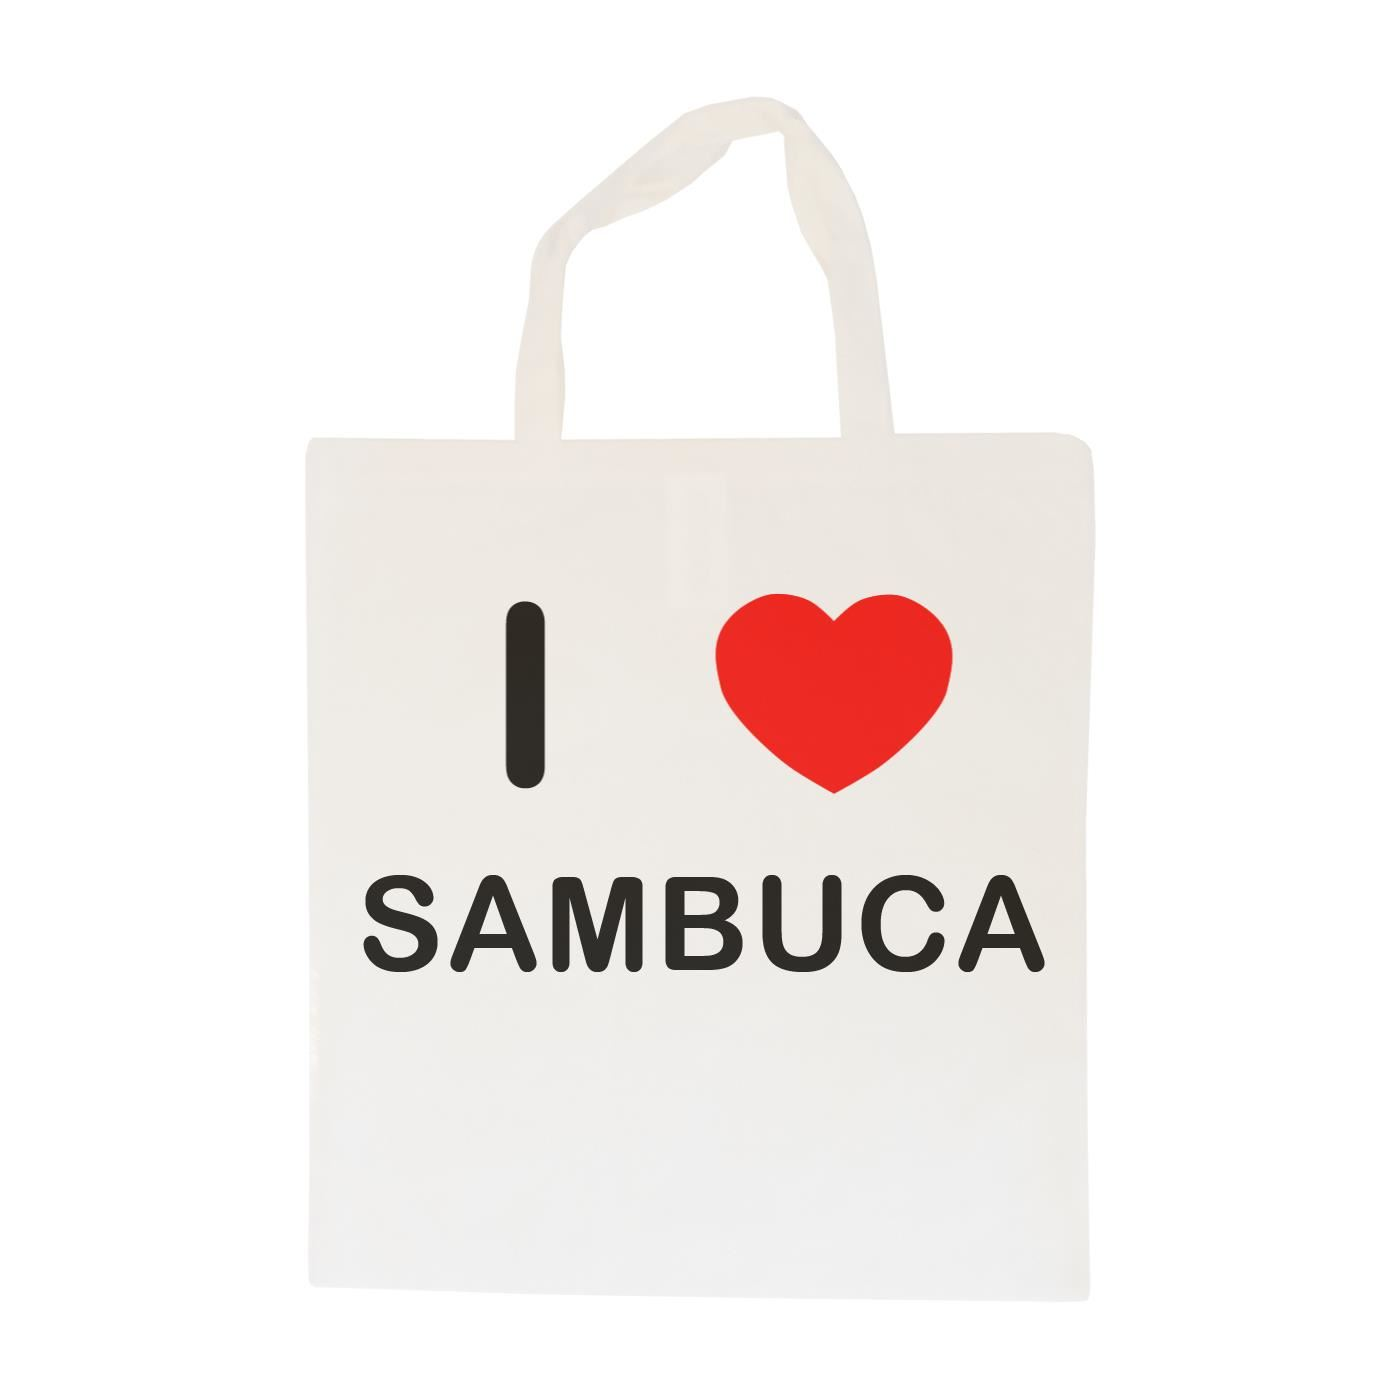 I Love Sambuca - Cotton Bag | Size choice Tote, Shopper or Sling